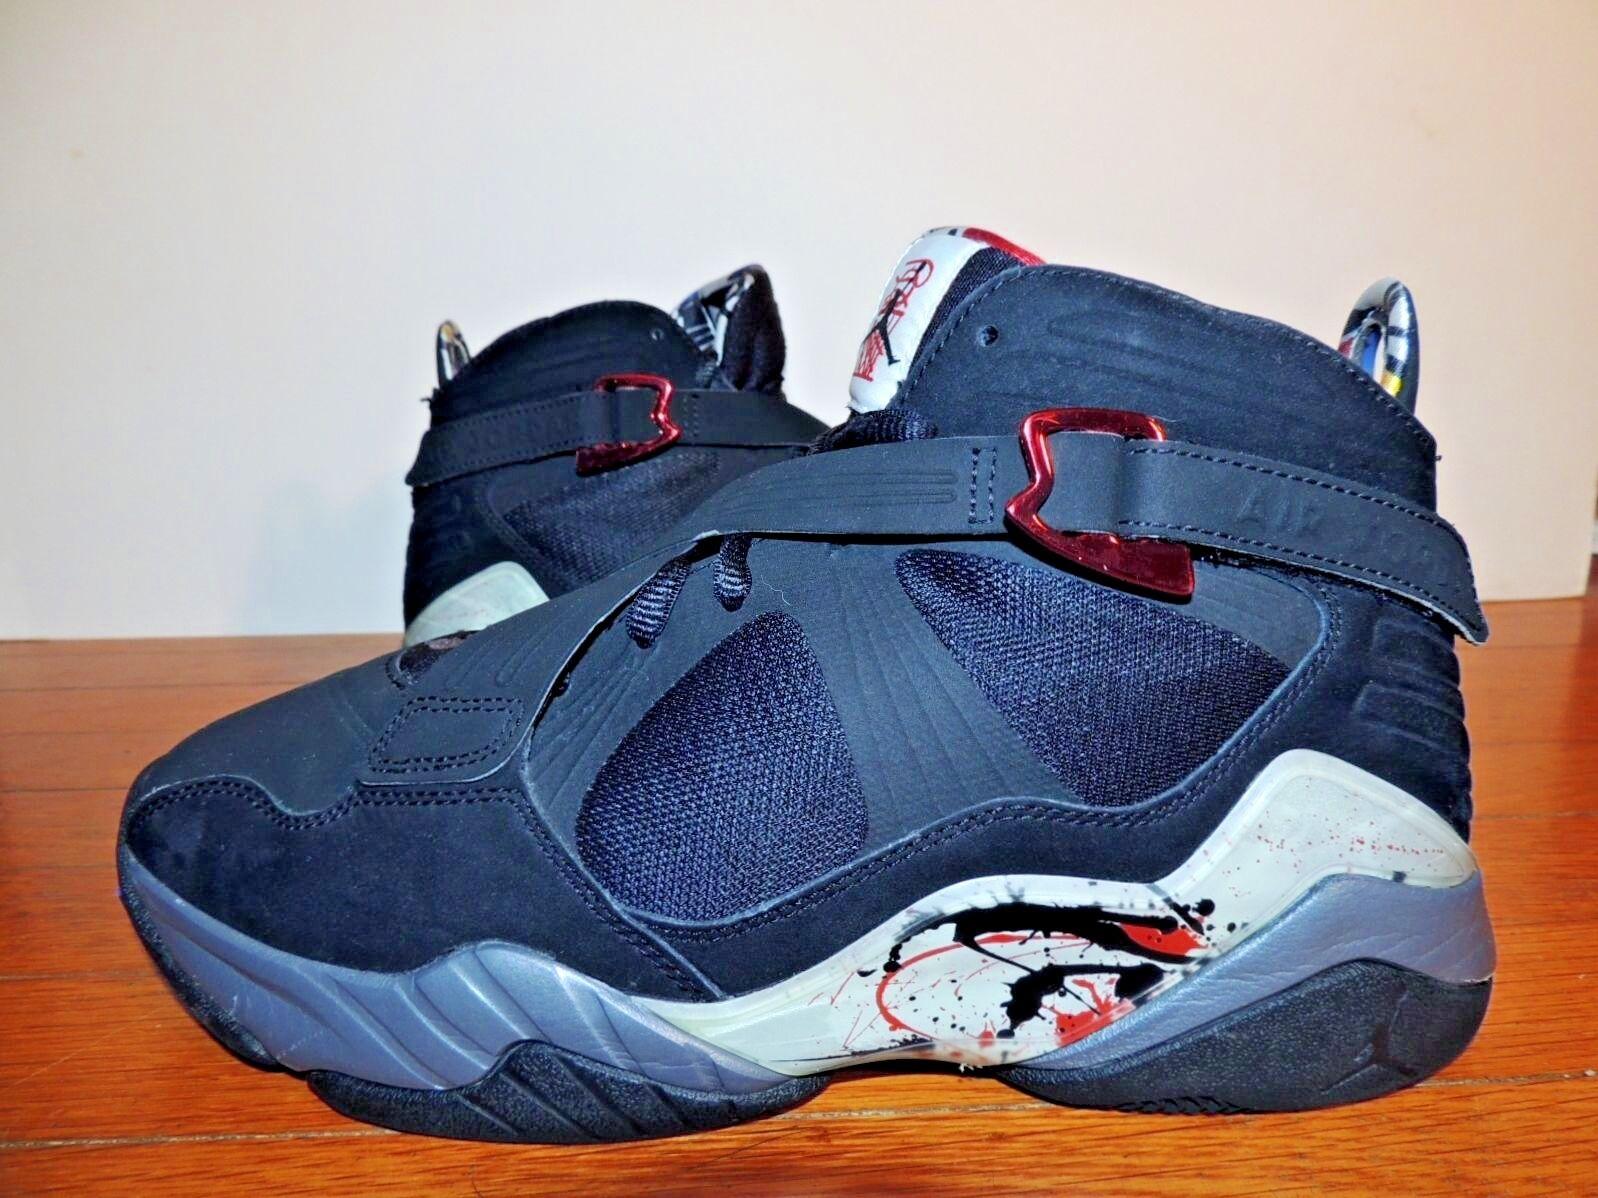 Nike Air Jordan 9.5 shoes Sneaker 467807-010 8.0 VIII OG Retro Varsity Red Flint